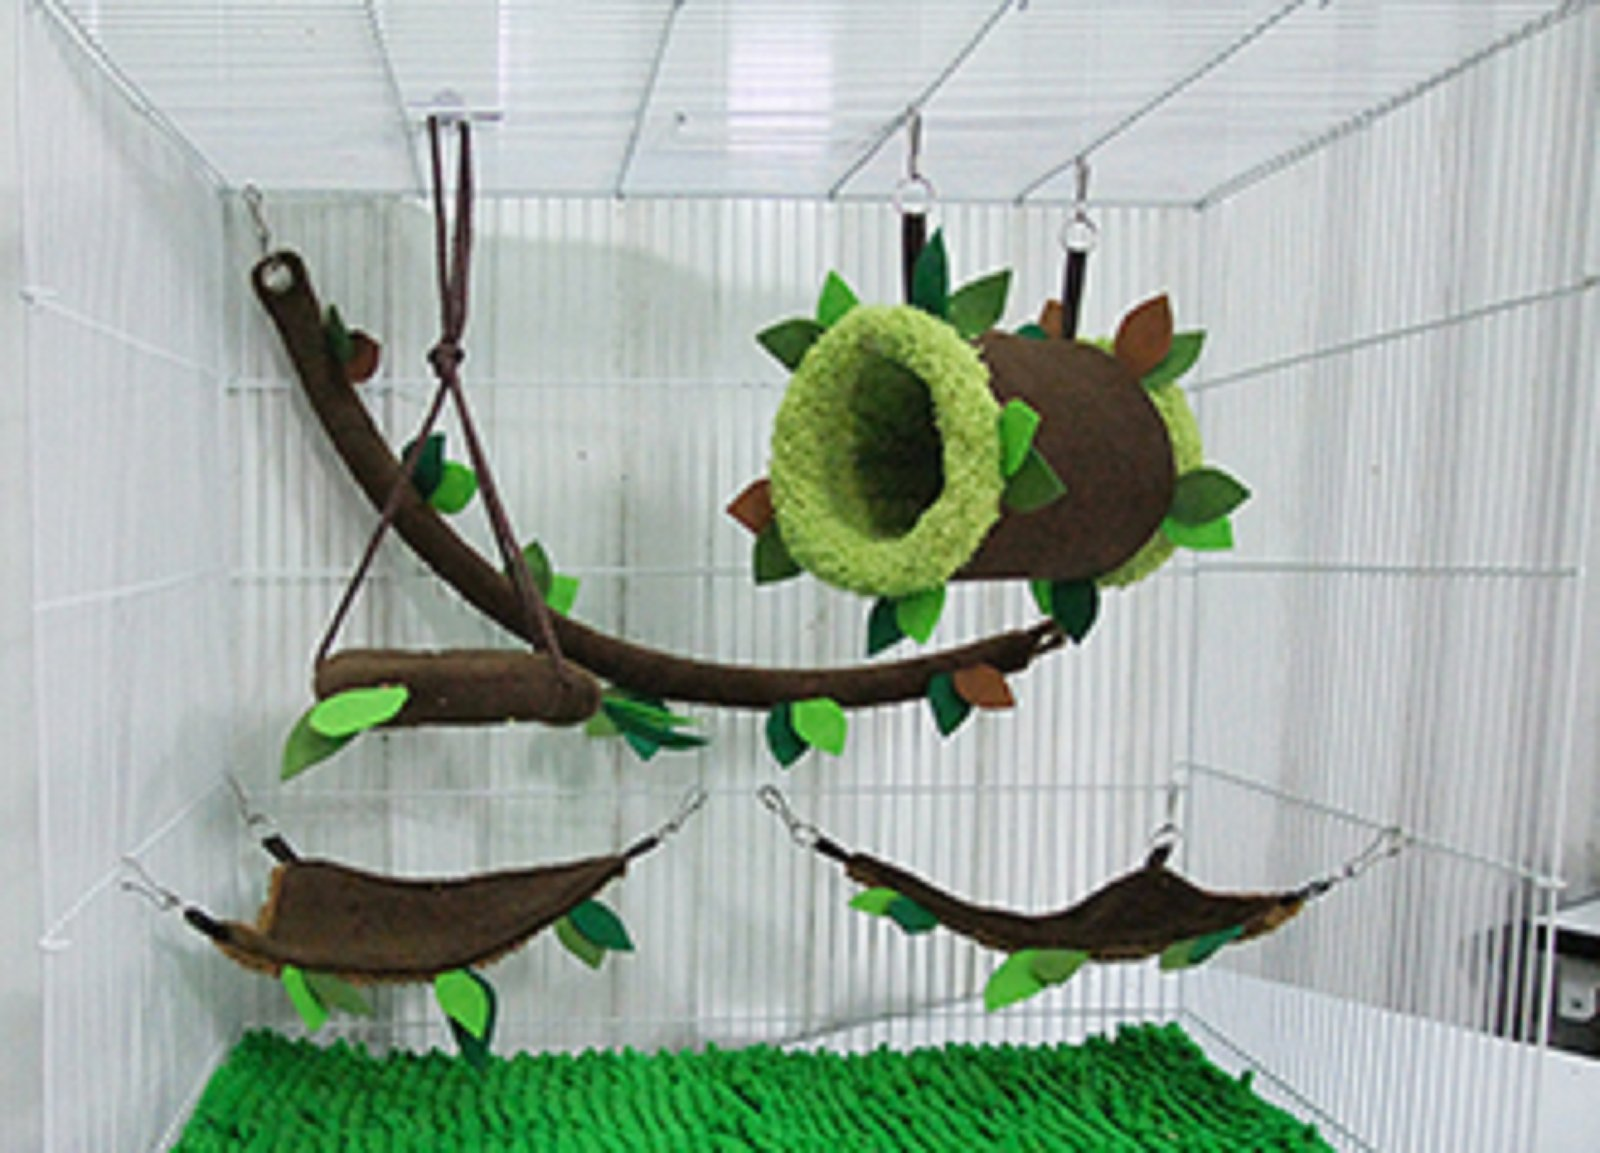 Hot Sale! 5 piece KPS Cute Sugar Glider Hamster Squirrel Small Pet Cage Set Forest Pattern, Polar Bear's Republic